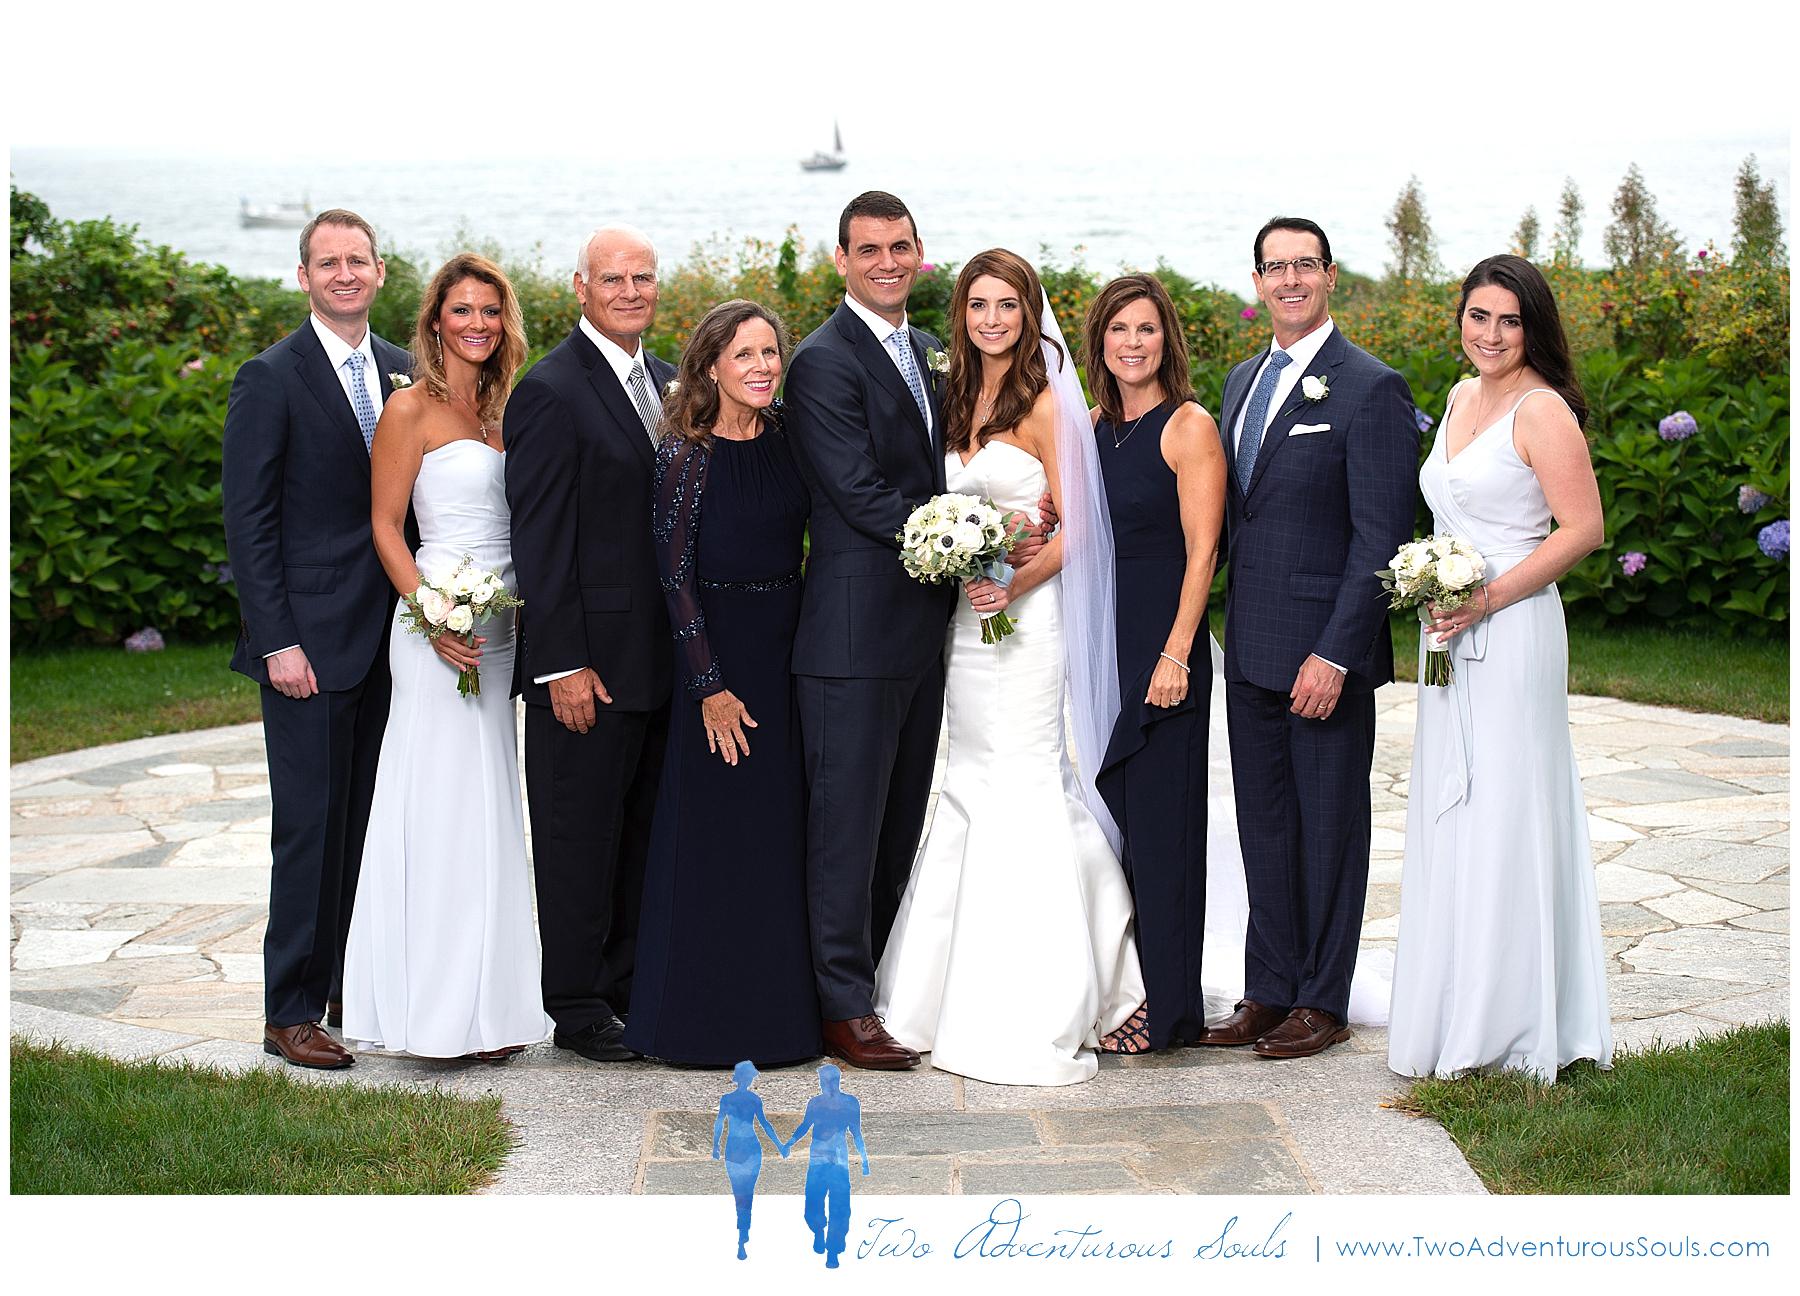 The+Colony+Hotel+Wedding,+Maine+Wedding+Photographers,+Kennebunkport+Wedding_0032.jpg